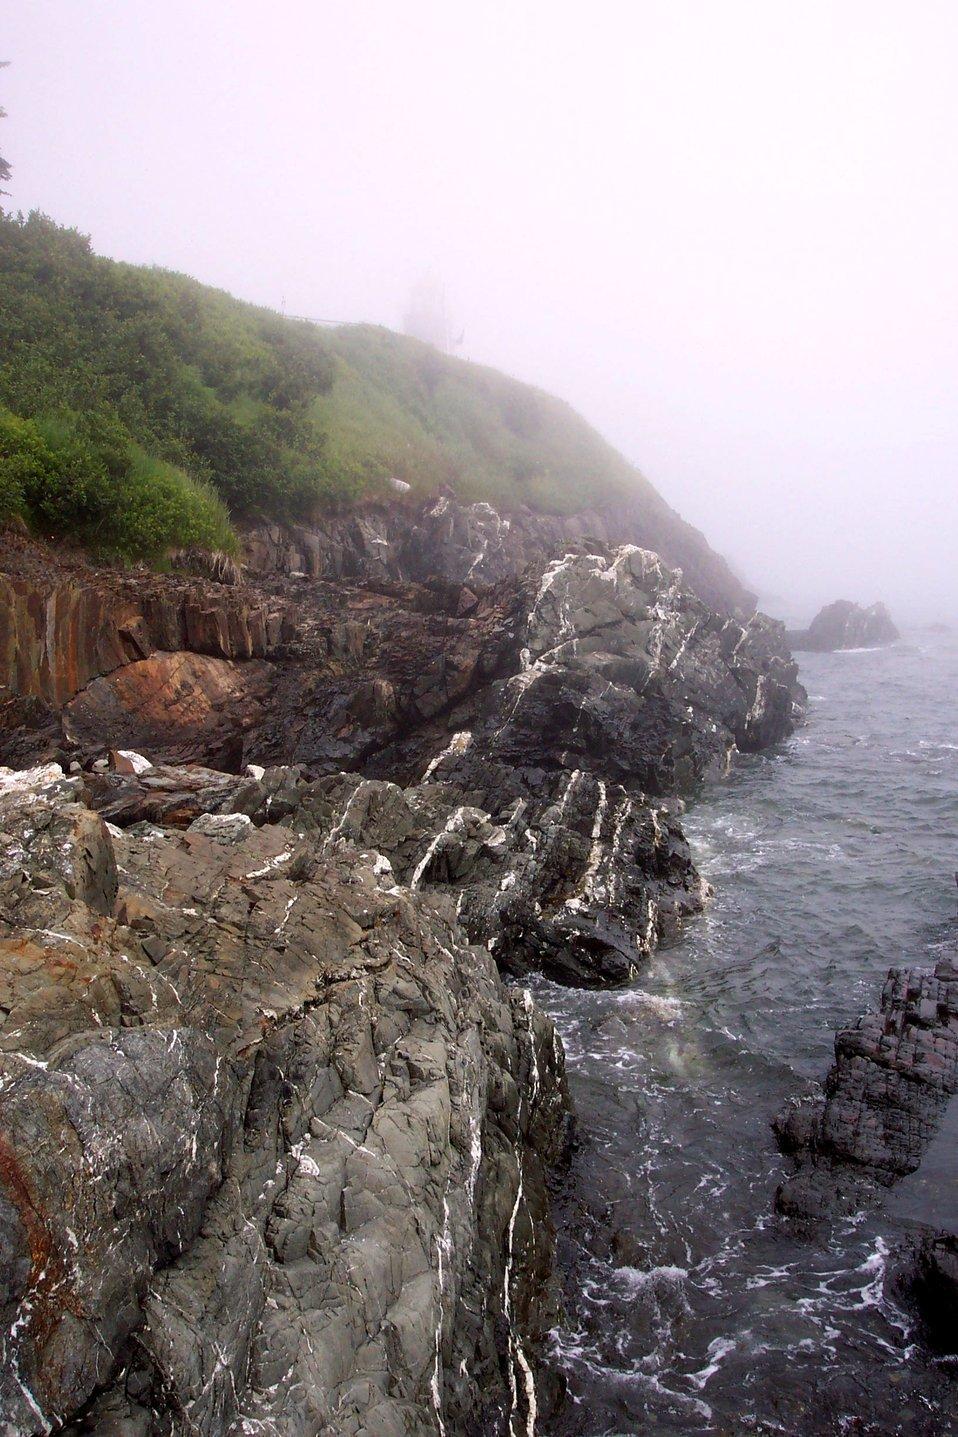 Quartz-veined metamorphic rocks meet the sea below a fog-shrouded lighthouse at West Quoddy Head.